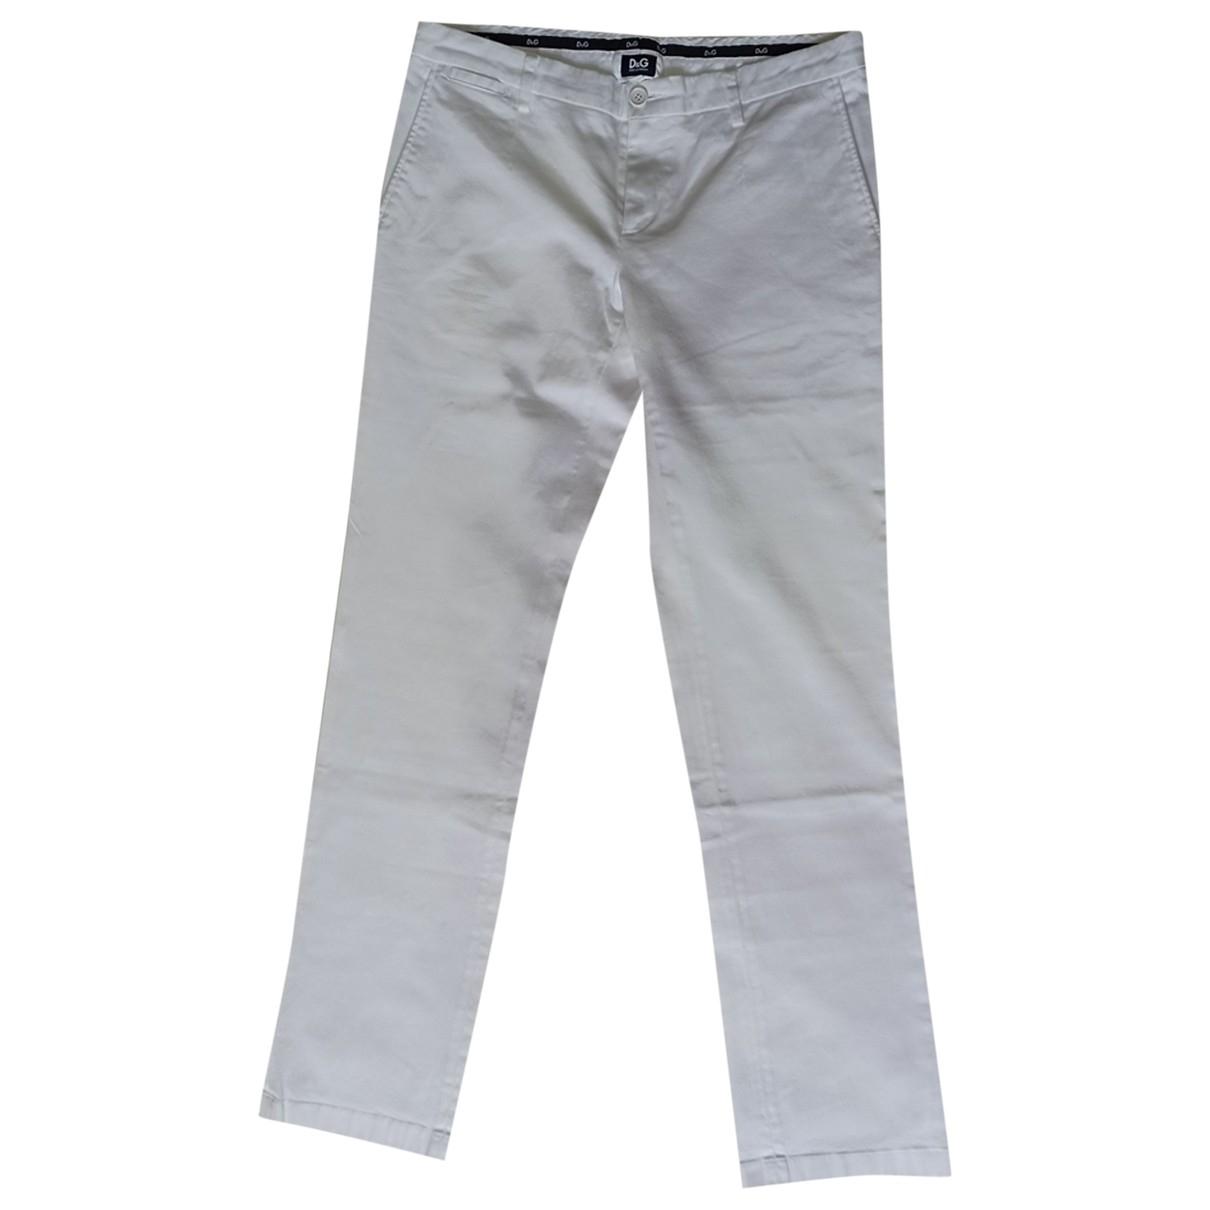 D&g \N White Cotton Trousers for Men 46 IT